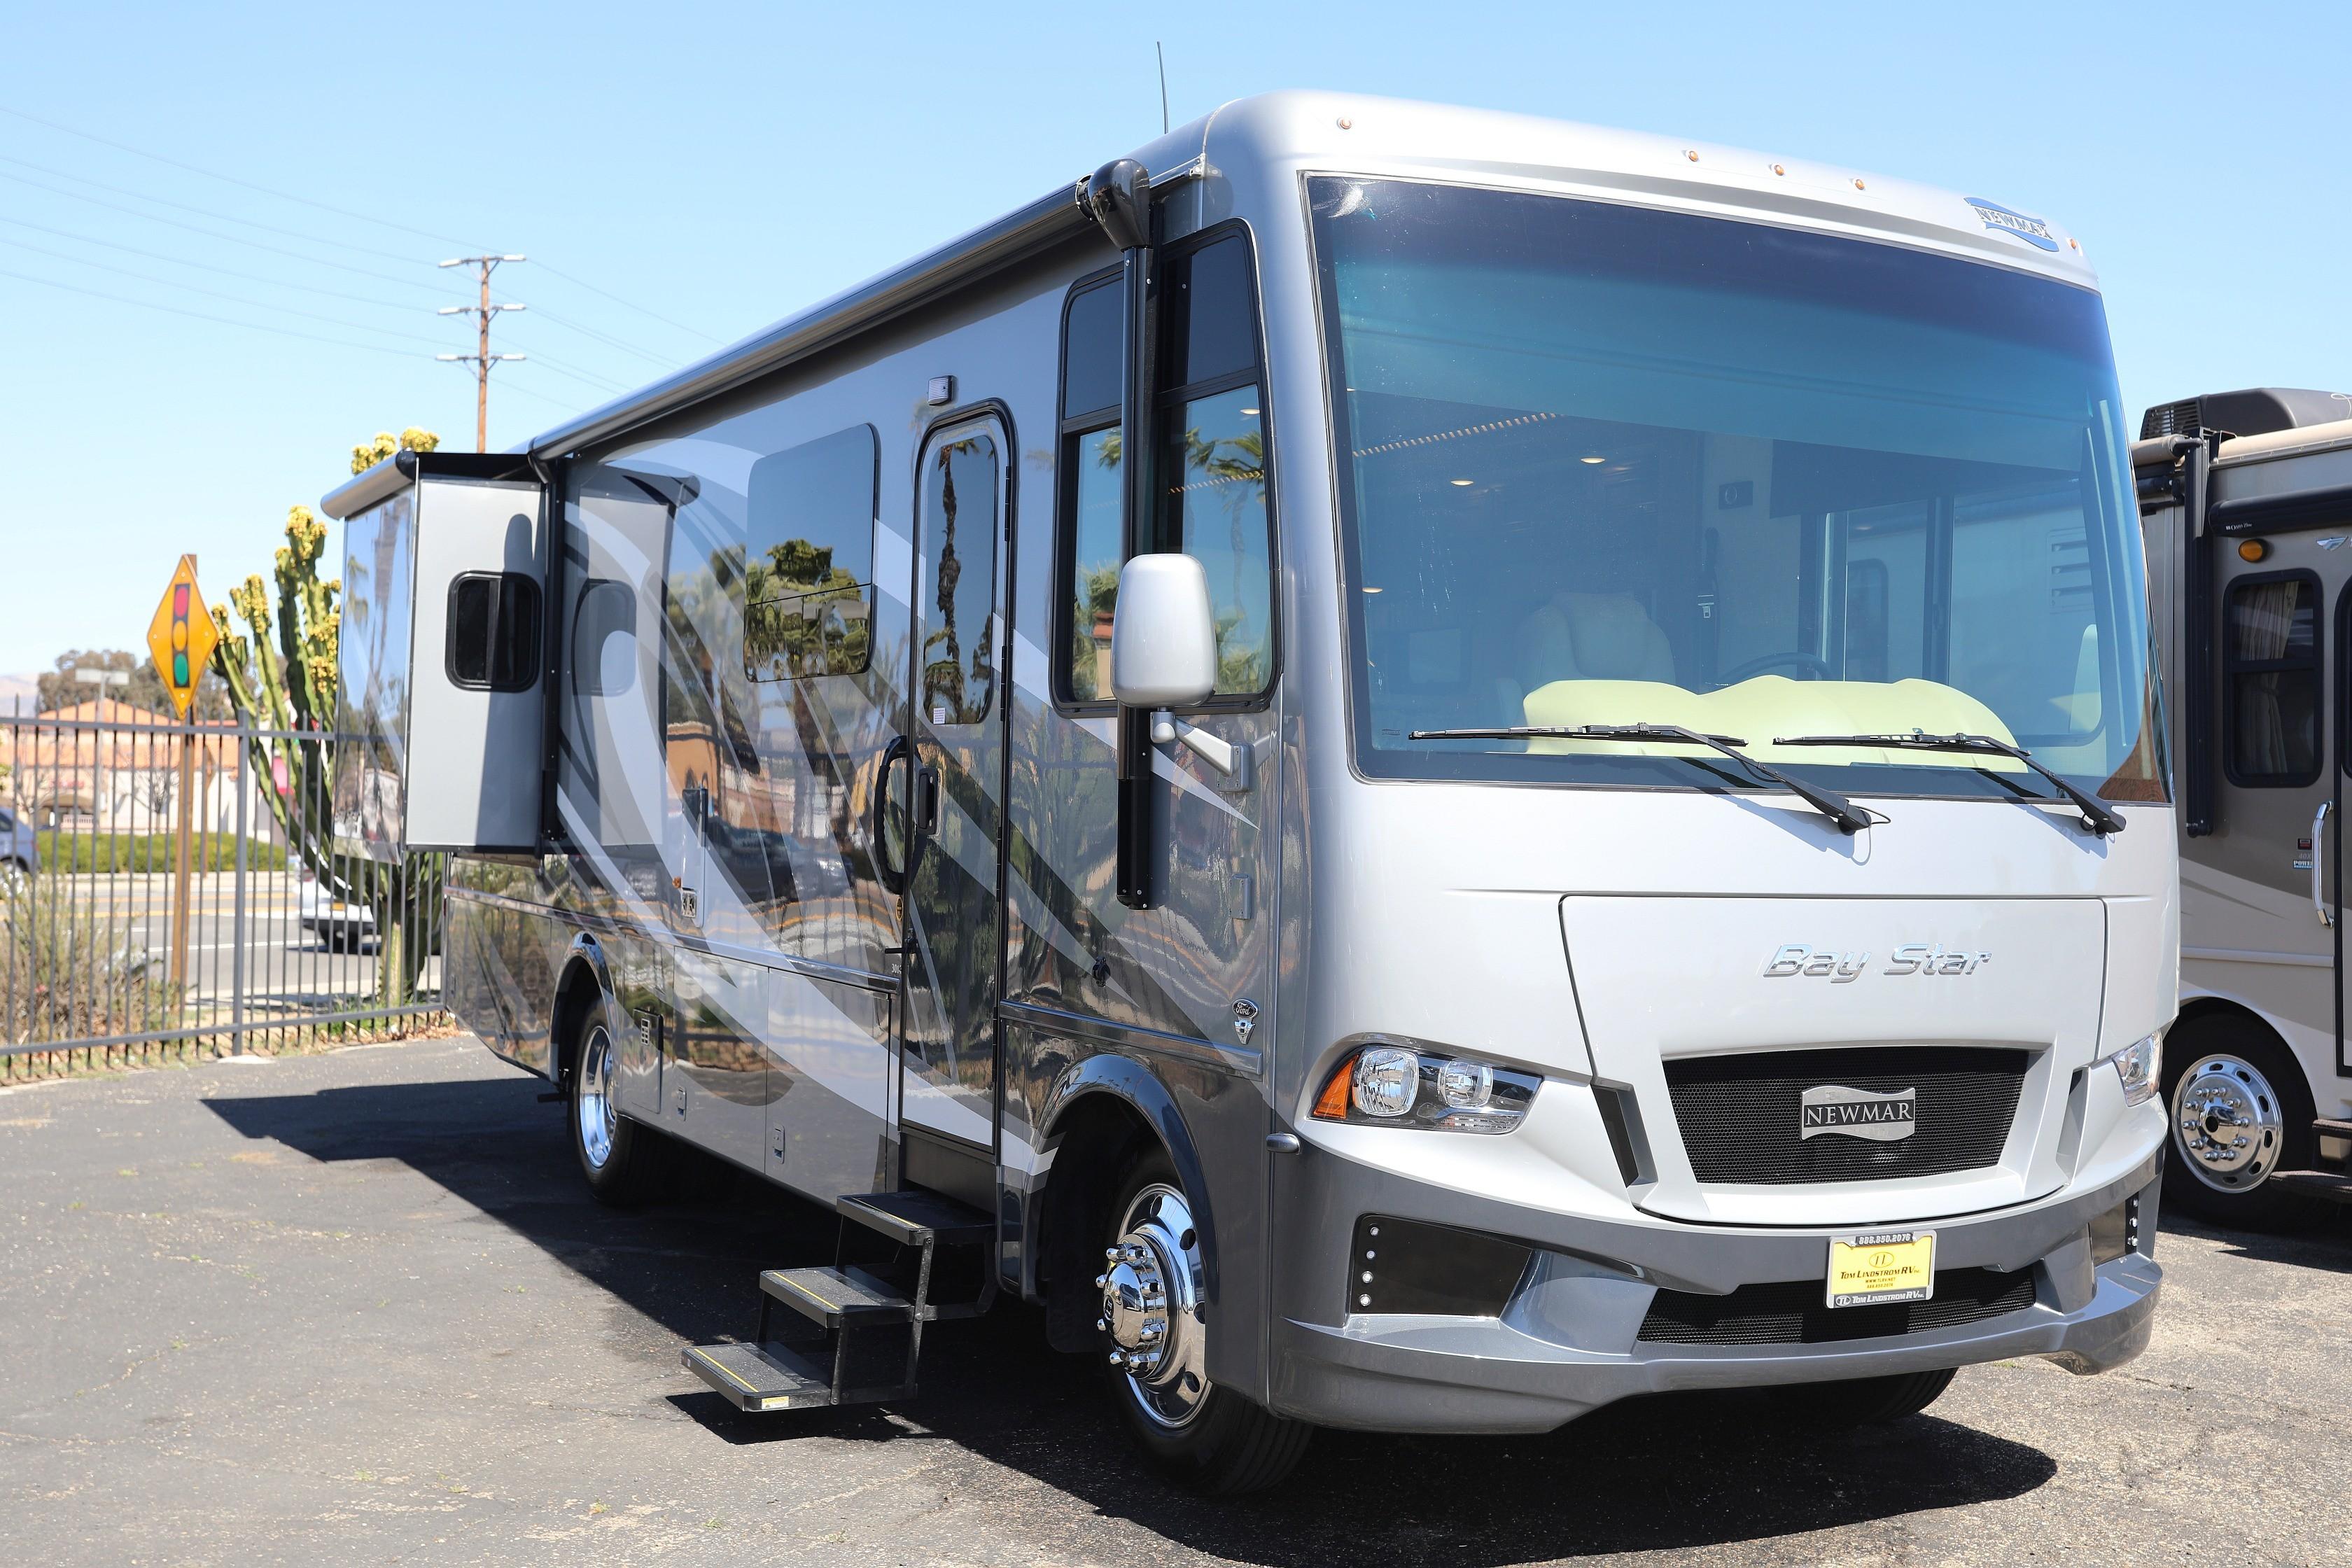 New, 2021, Newmar, Bay Star 3014, RV - Class A